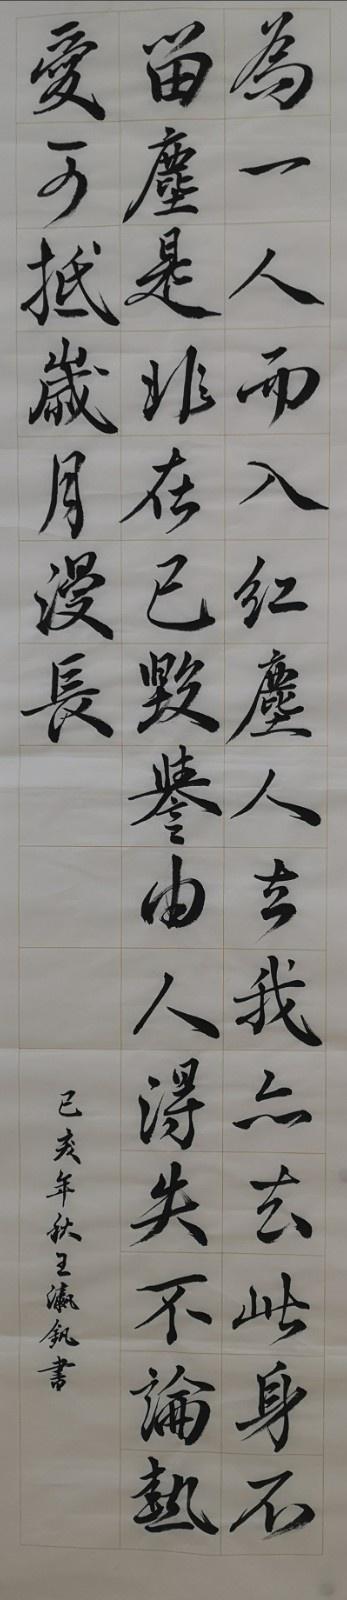 A2-B 王瀛钒.jpg